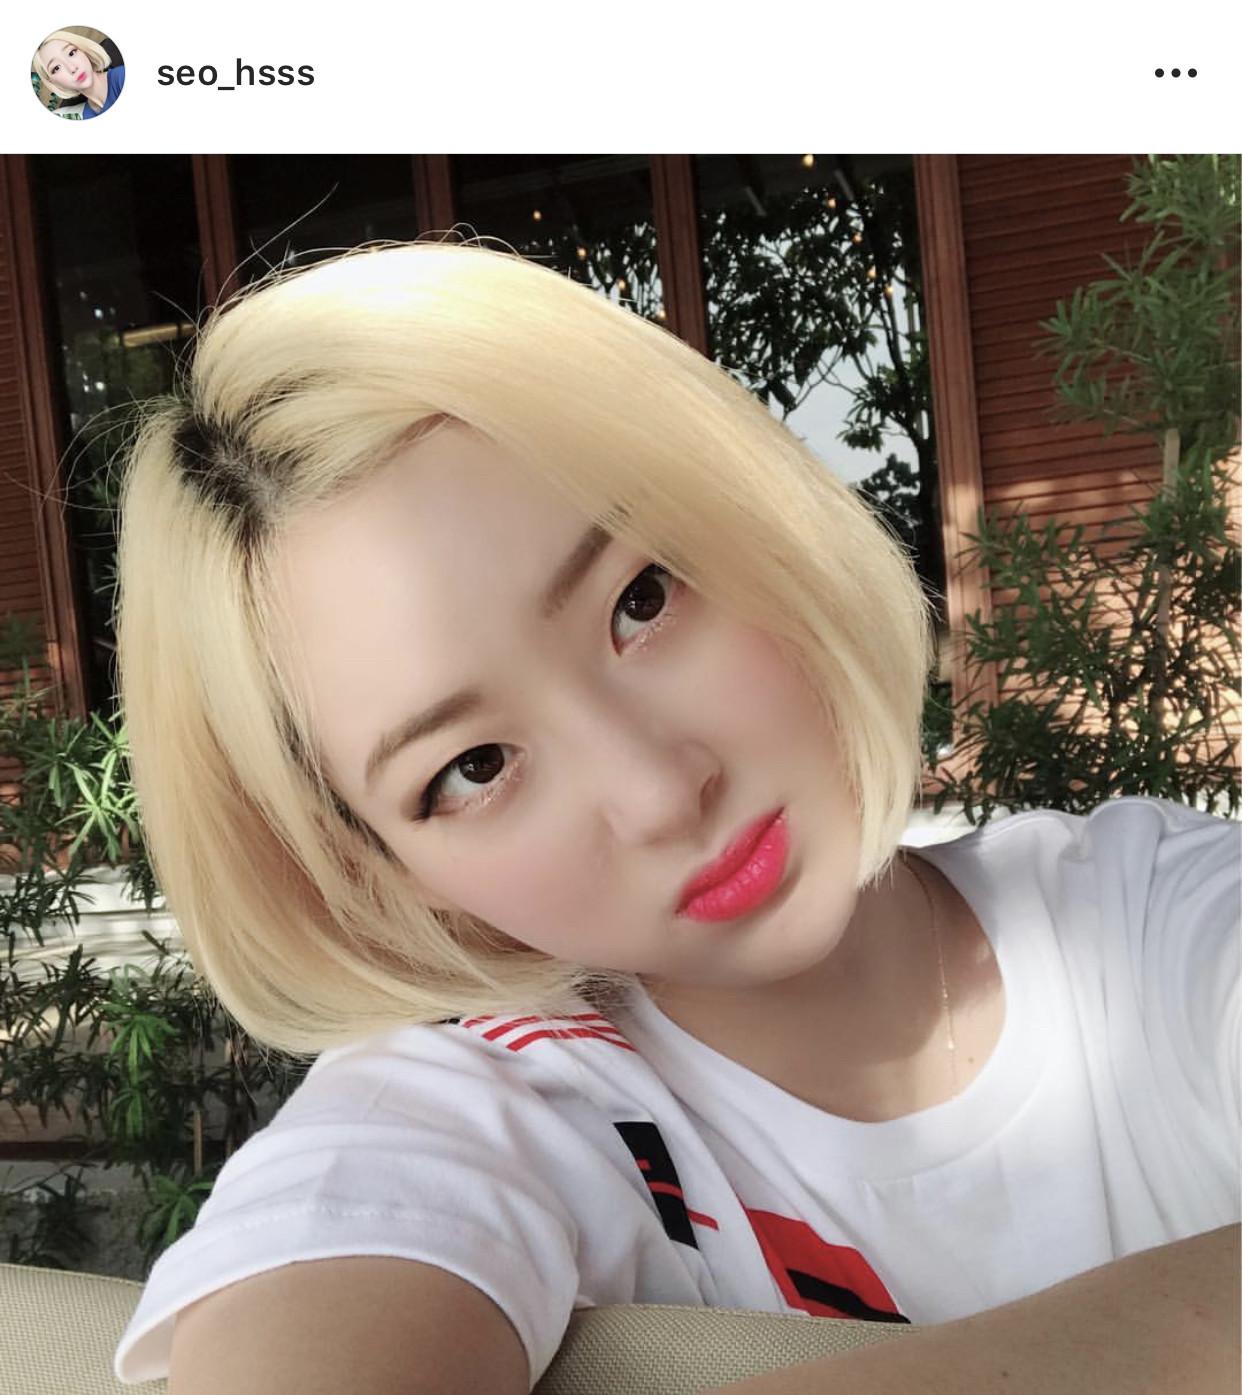 https://image.fmkorea.com/files/attach/new/20181016/486616/412183146/1326091372/cbc2b9286c0fe869e7d8061589b3e9b9.jpeg